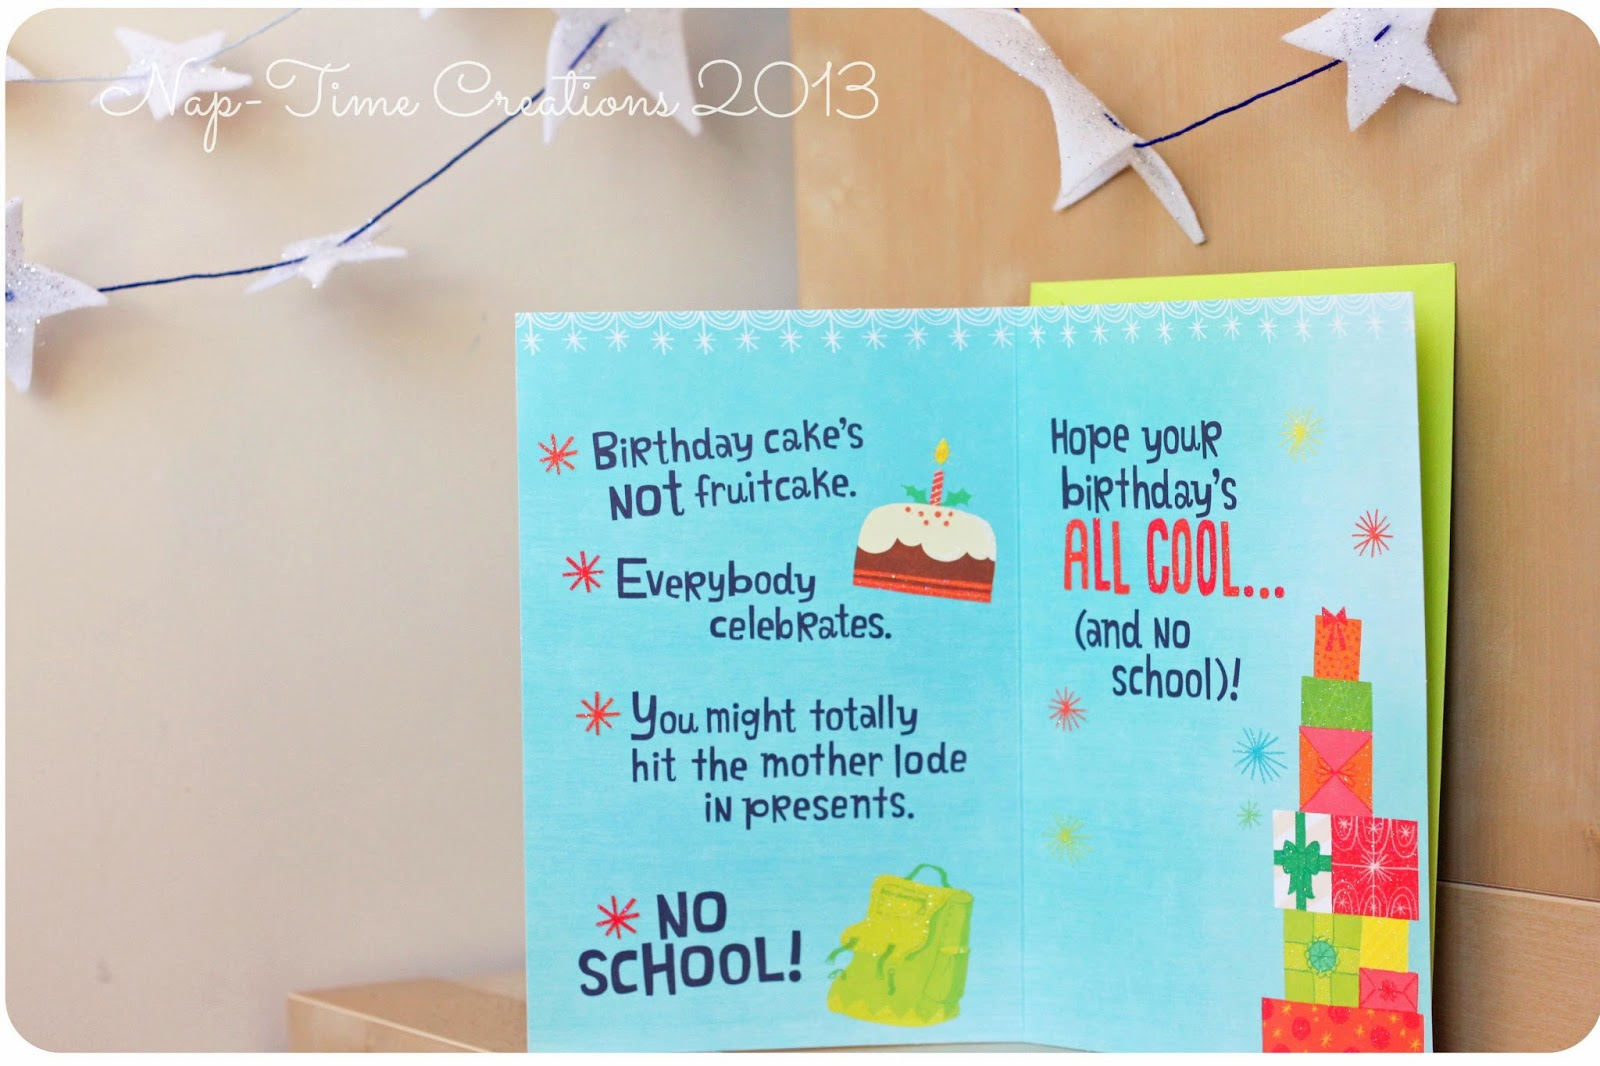 Holiday birthday wishes from hallmark life sew savory m4hsunfo